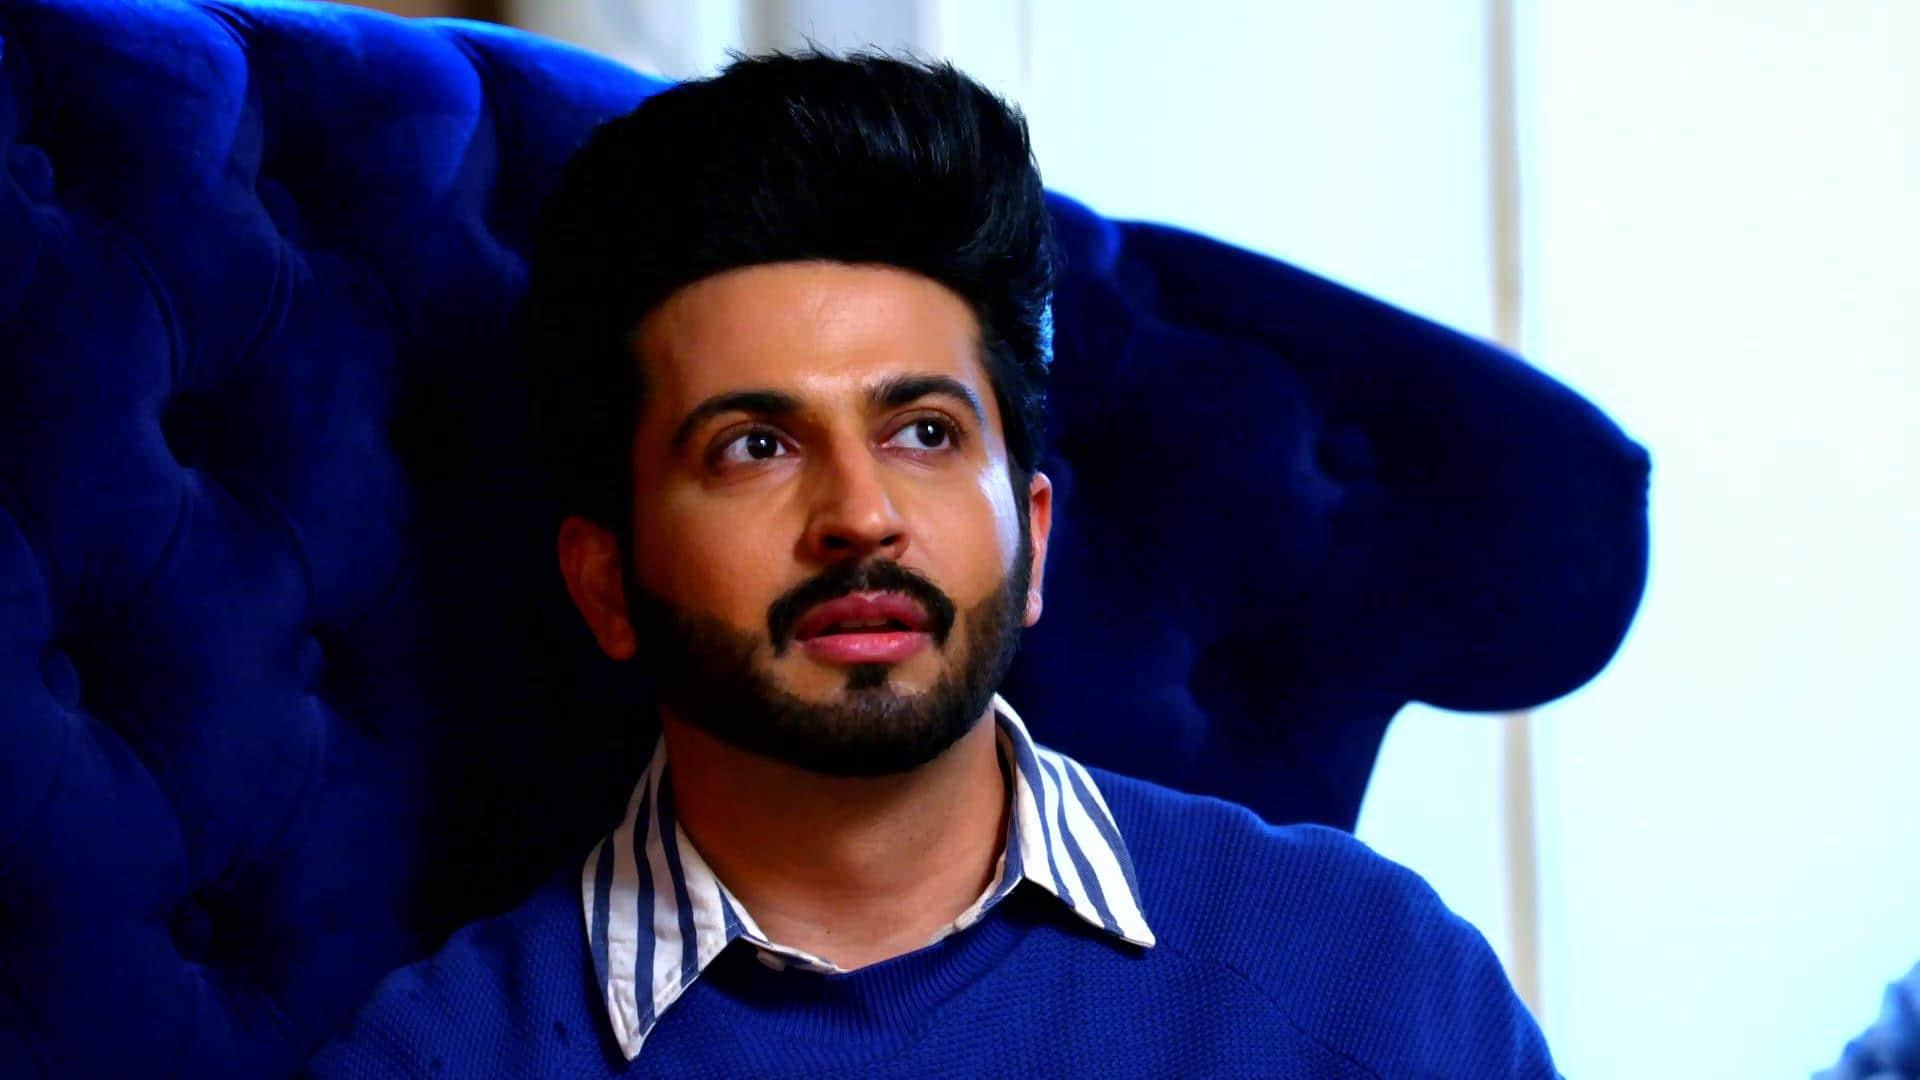 Kundali Bhagya 31 July 2021 Spoiler: Preeta asks Karan to help Rajat woo Sonakshi